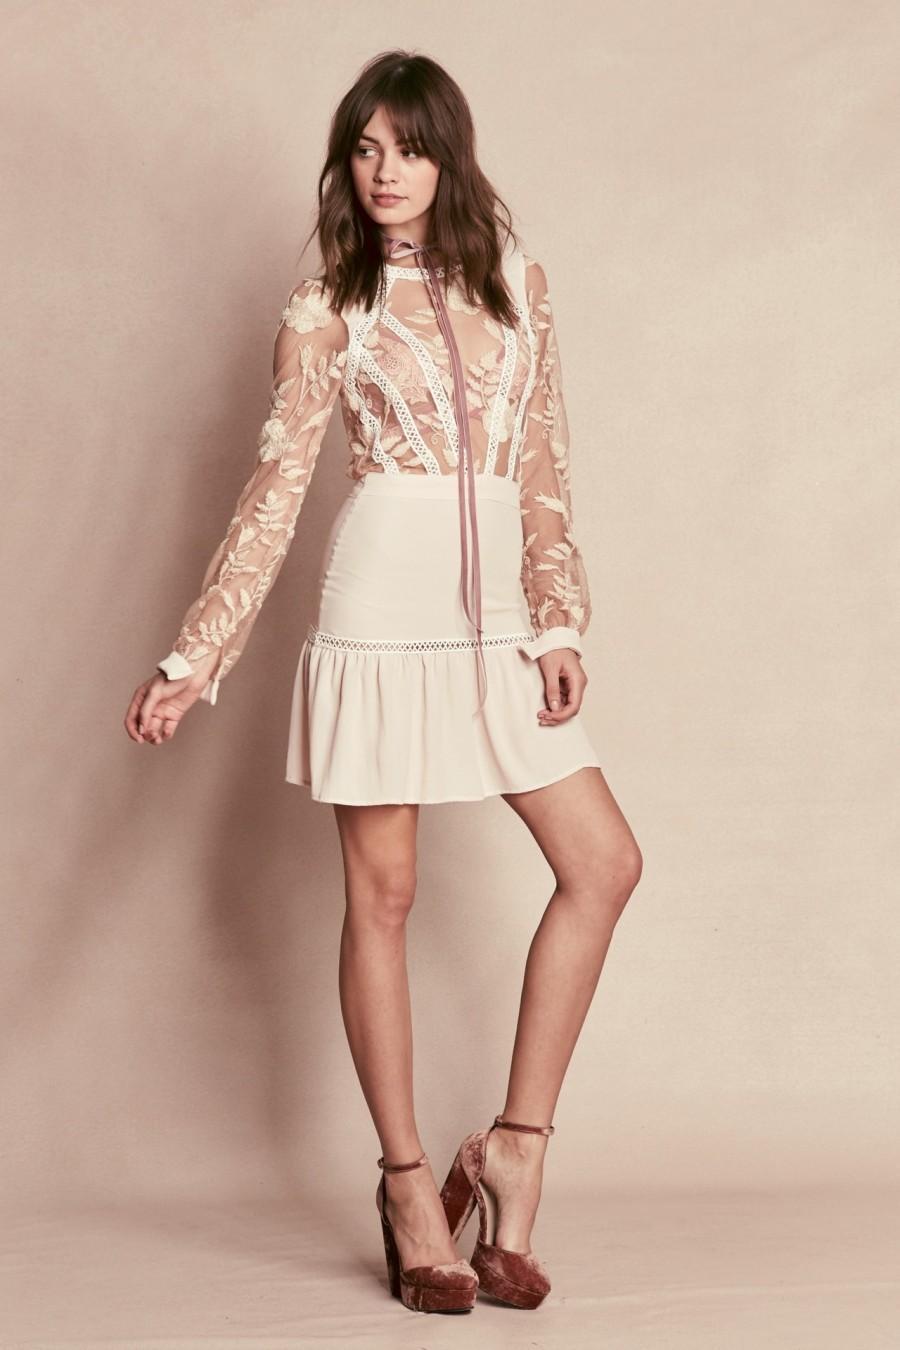 For Love Lemons Emelia Embroidered Mini Dress 198 00 Lovelacedress For The One Who Loves Lace Dress Online Shopping 2567317 Weddbook